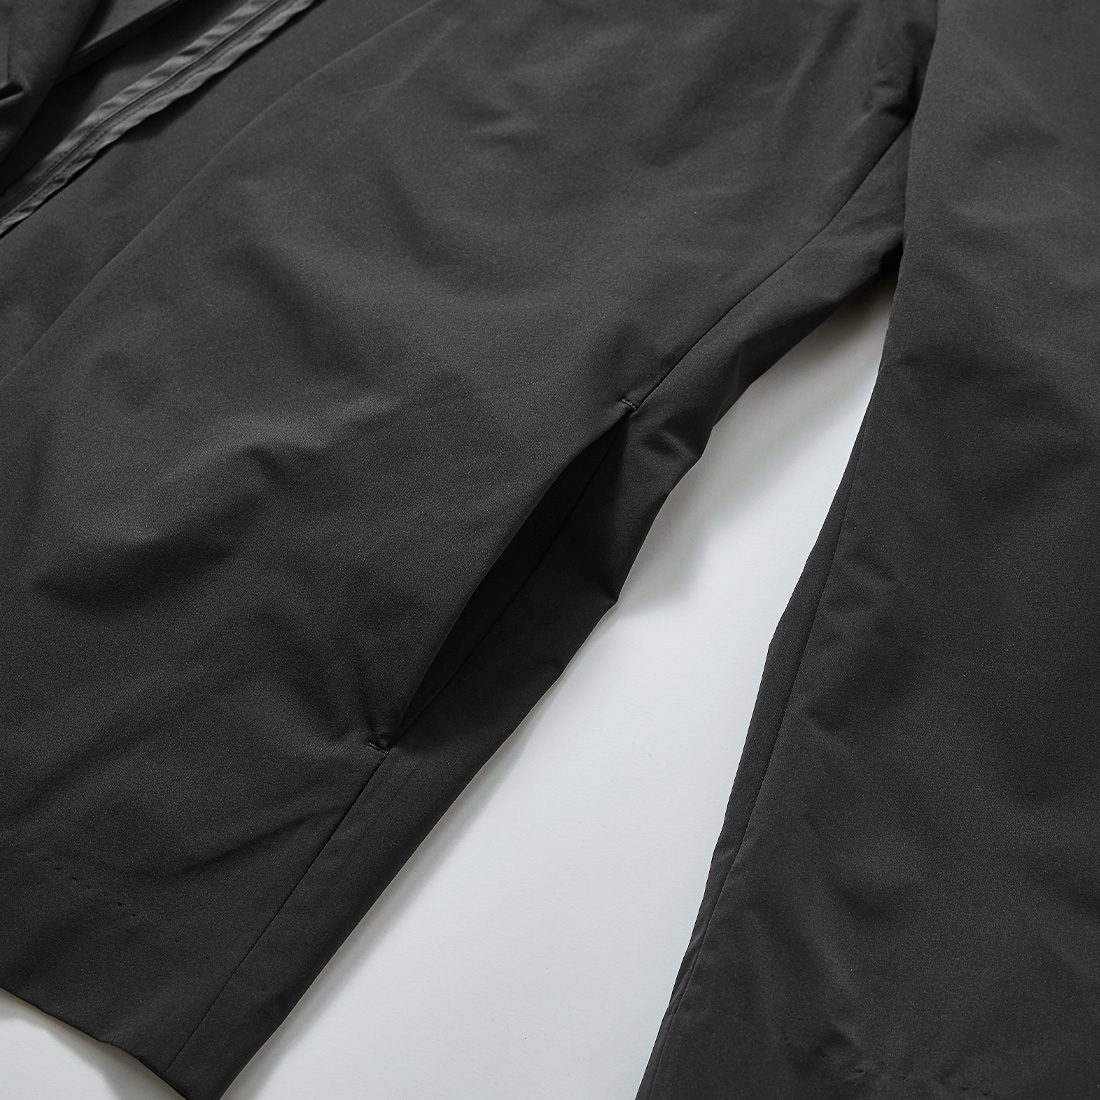 borderless no-collar jacket -male-の商品写真6